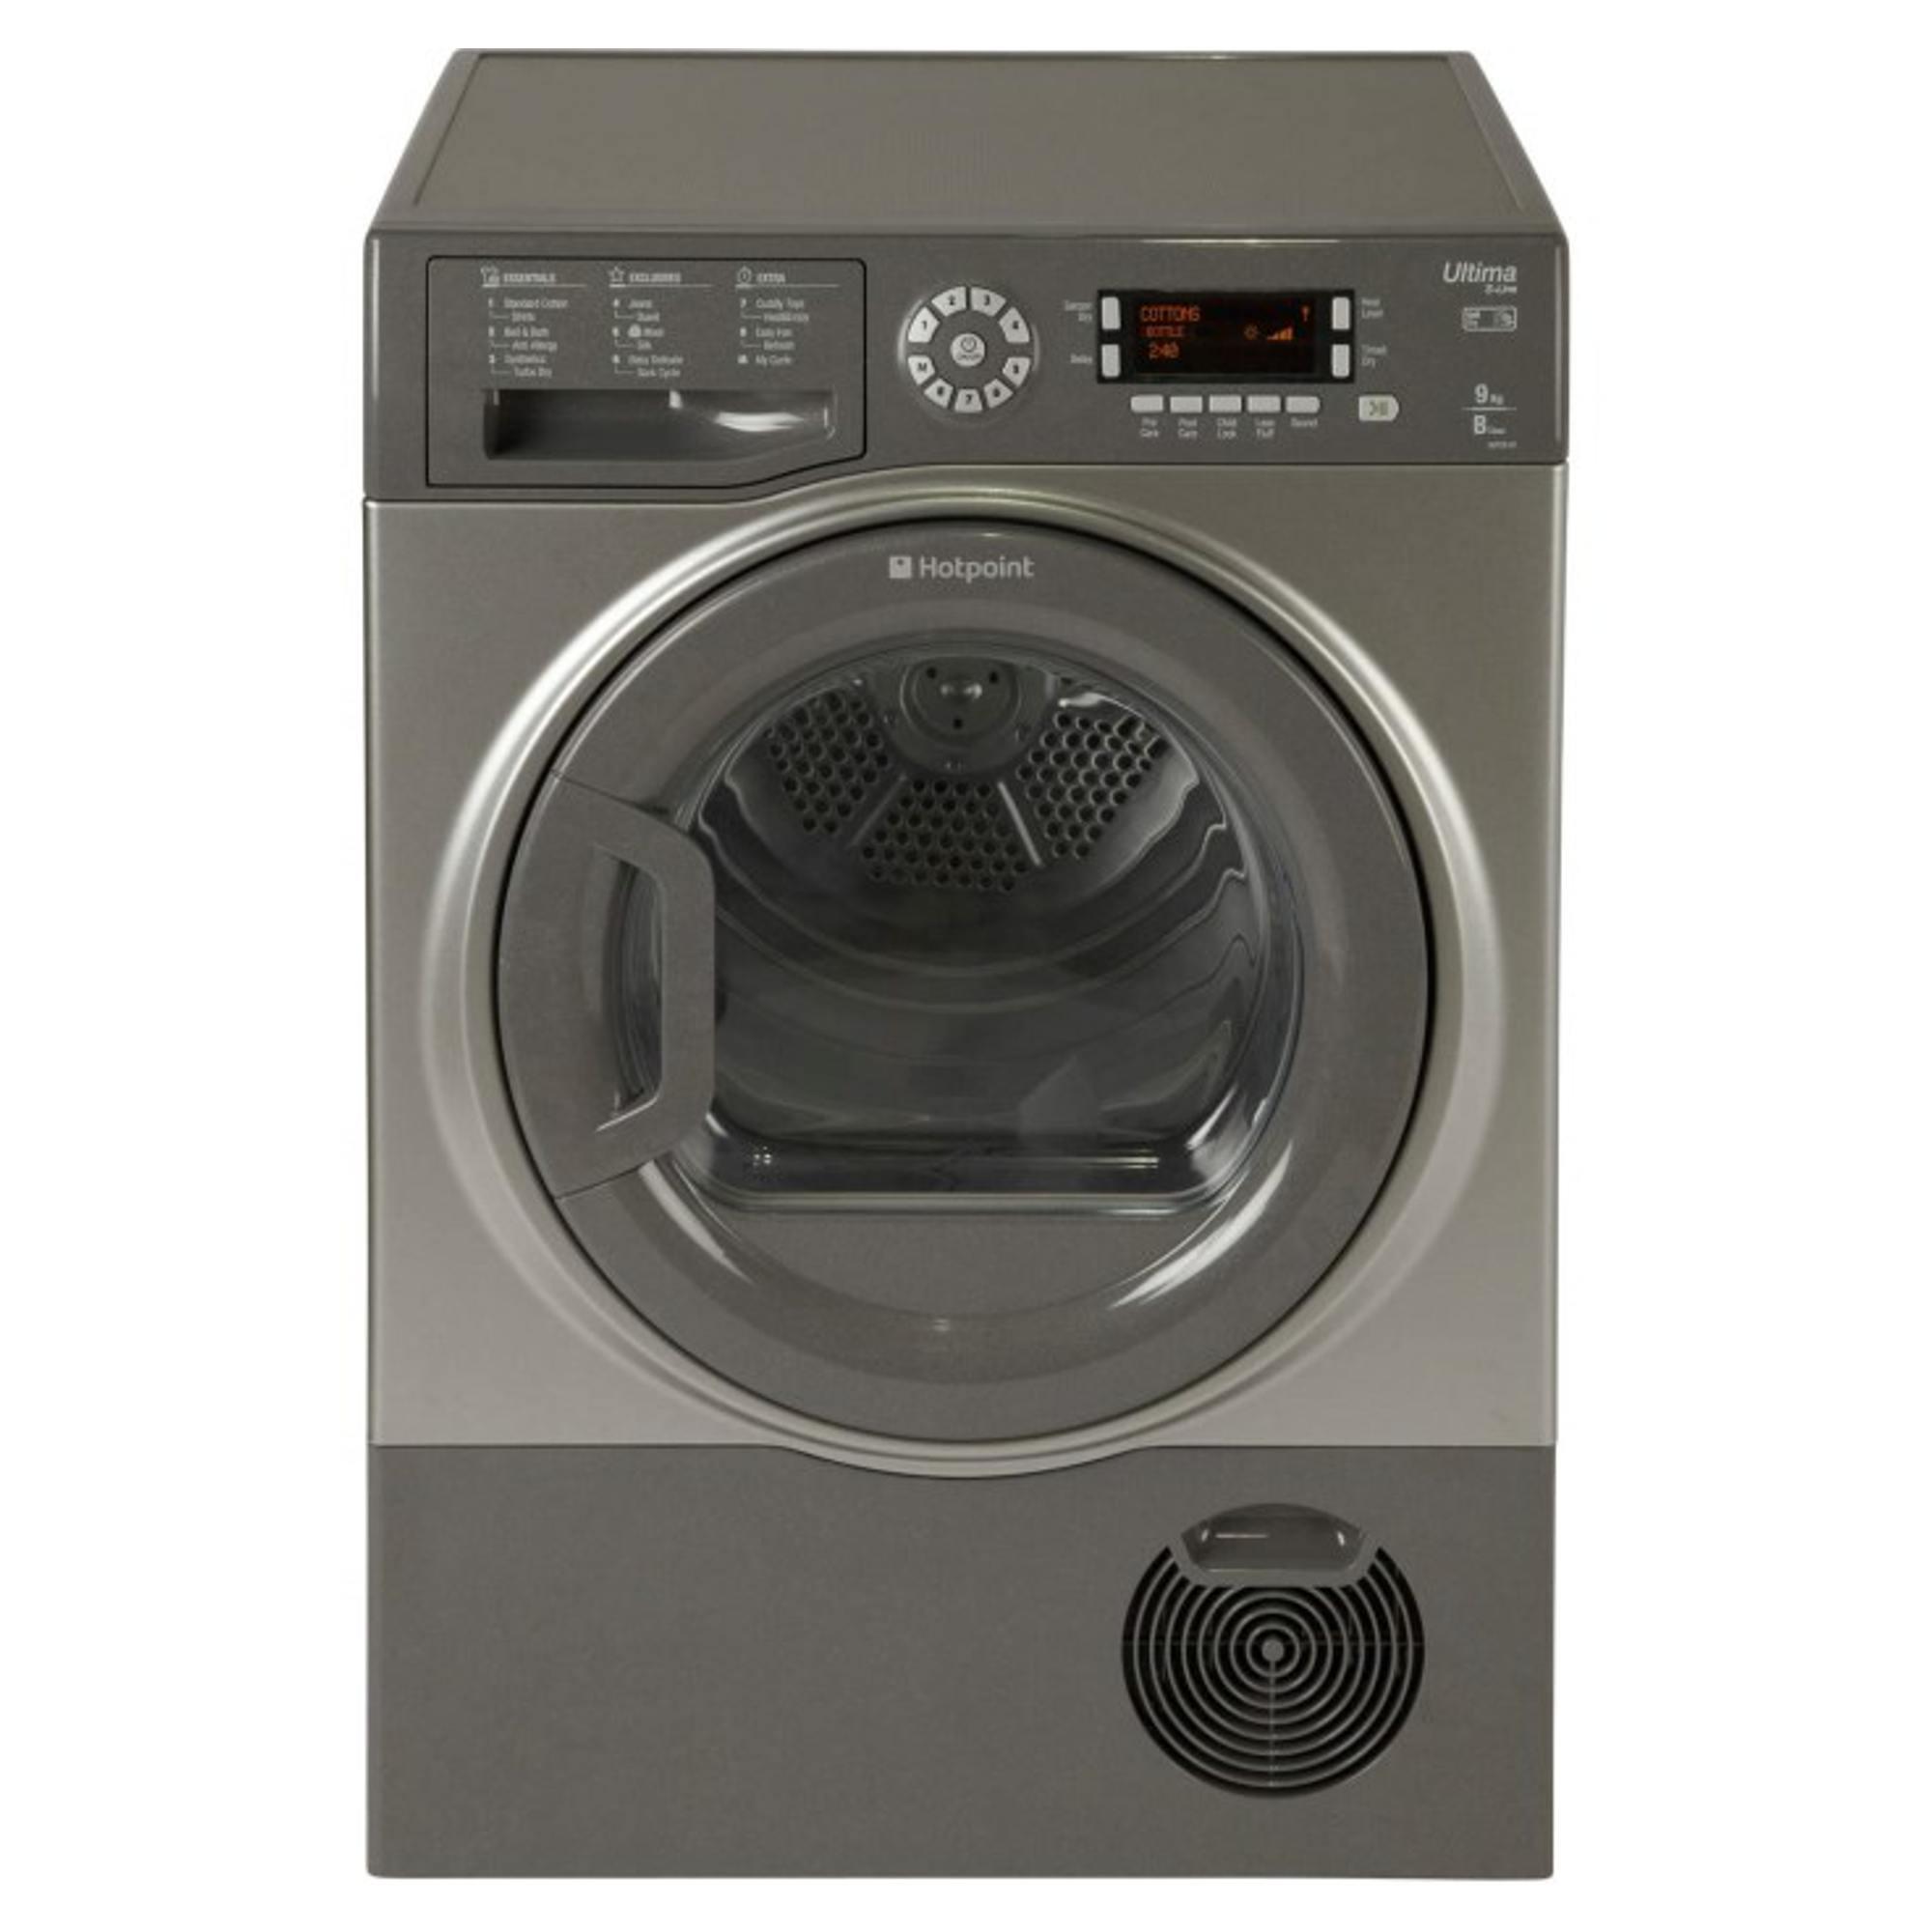 Hotpoint Sutcd97b6gm 9kg Condenser Tumble Dryer Hughes